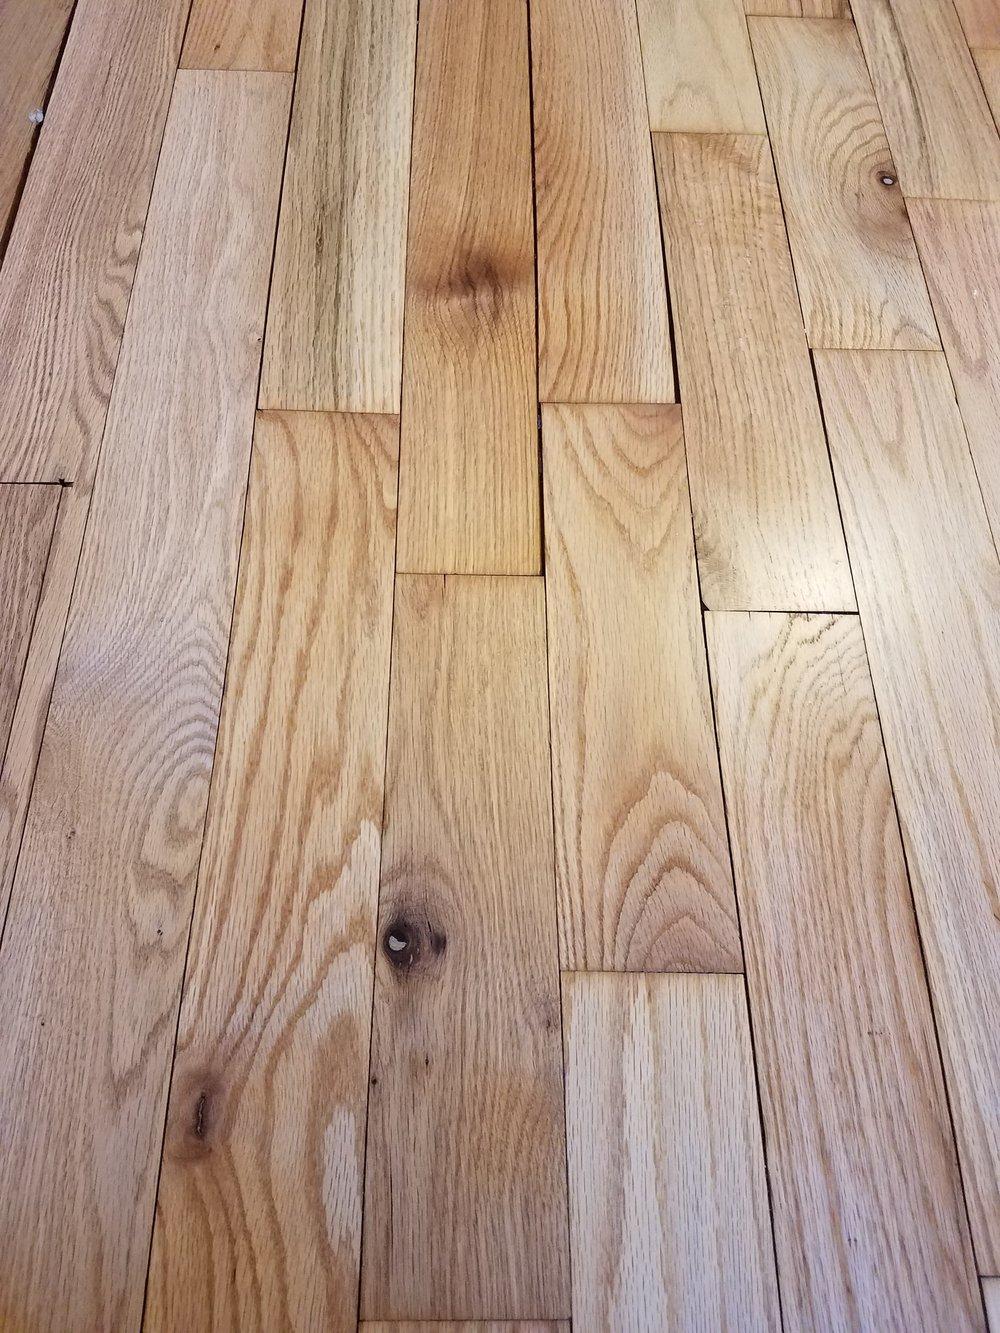 woodgrain1.jpg